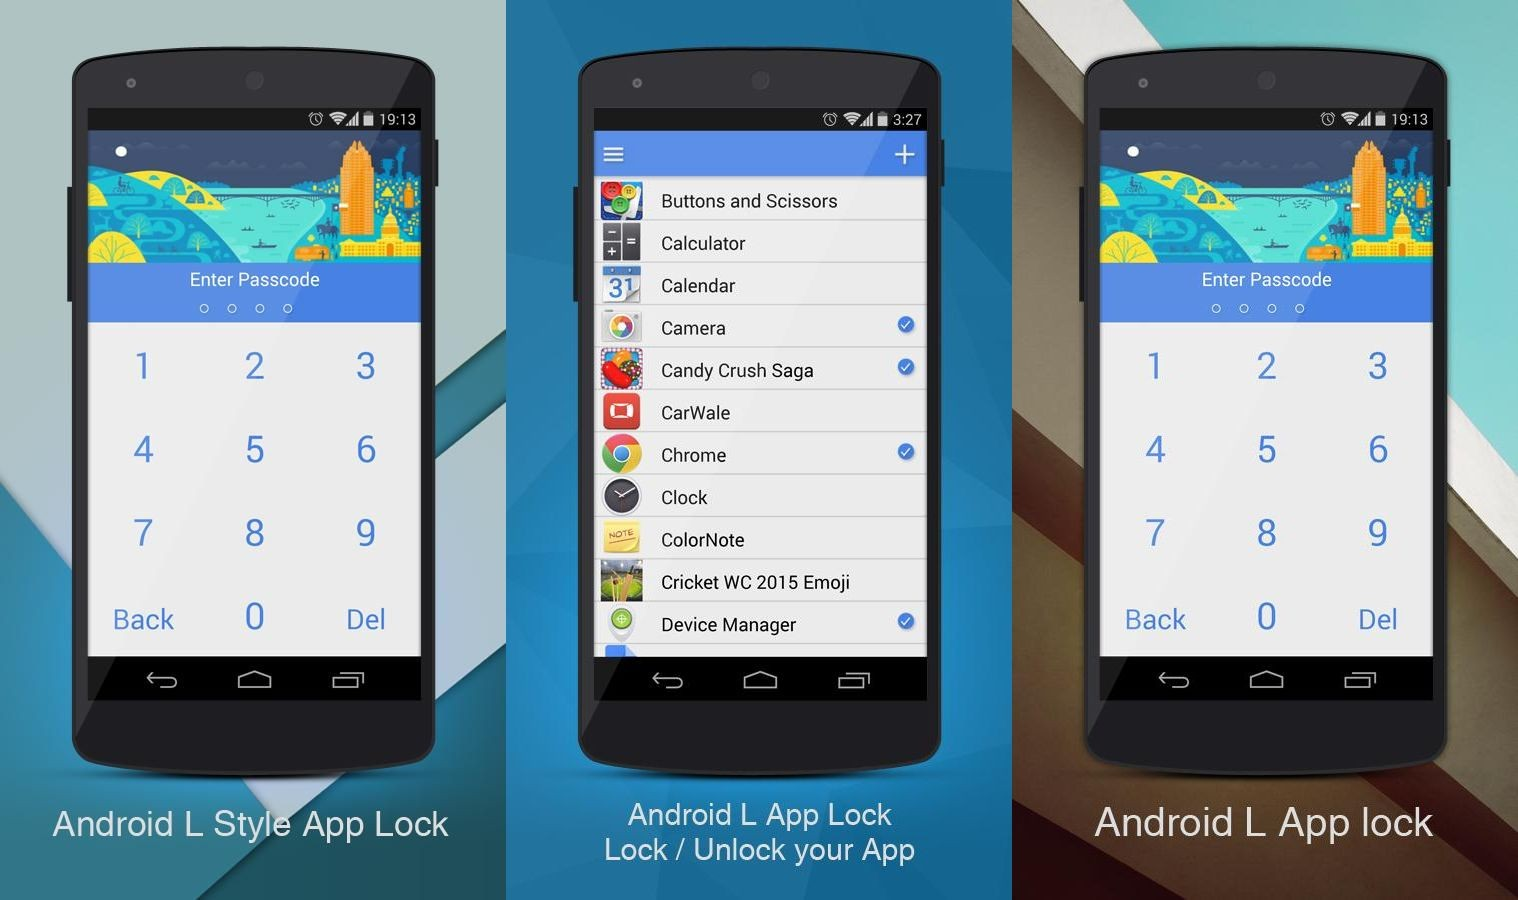 android l app lock